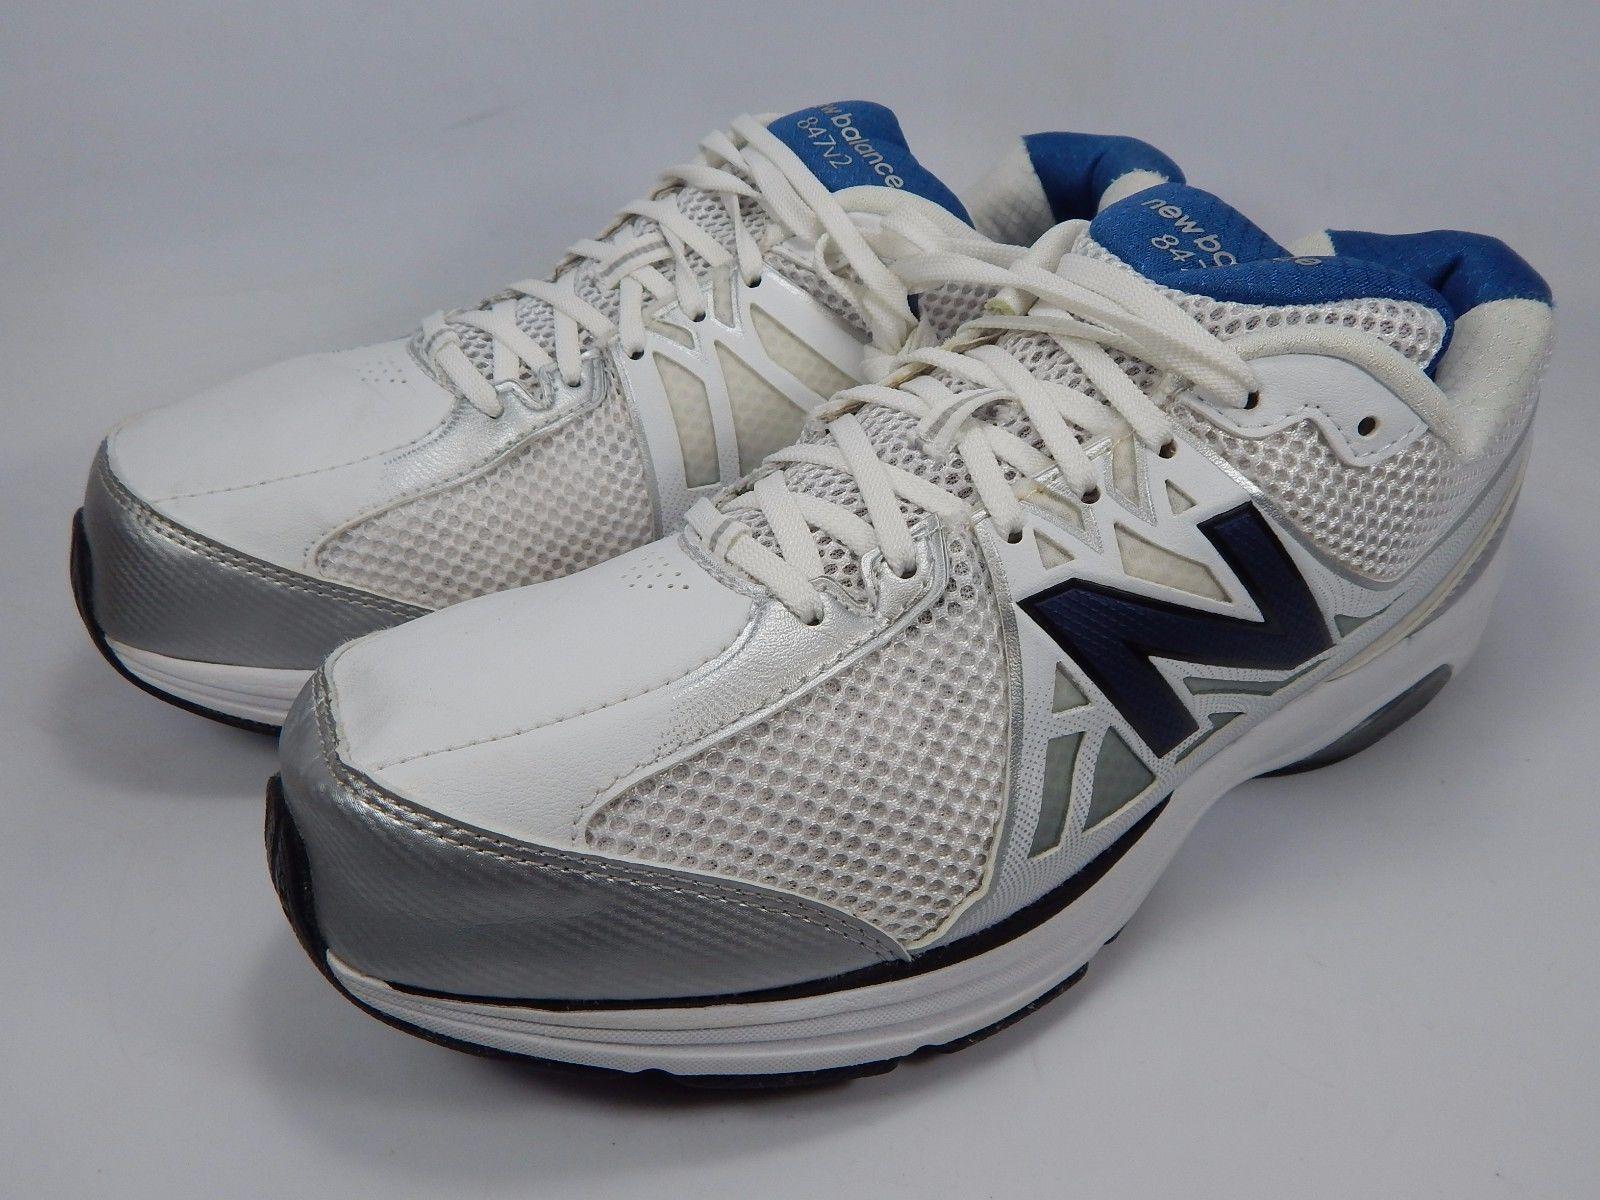 New Balance 847 v2 Men's Walking Shoes Size US 10 M (D) EU 44 White MW847WT2